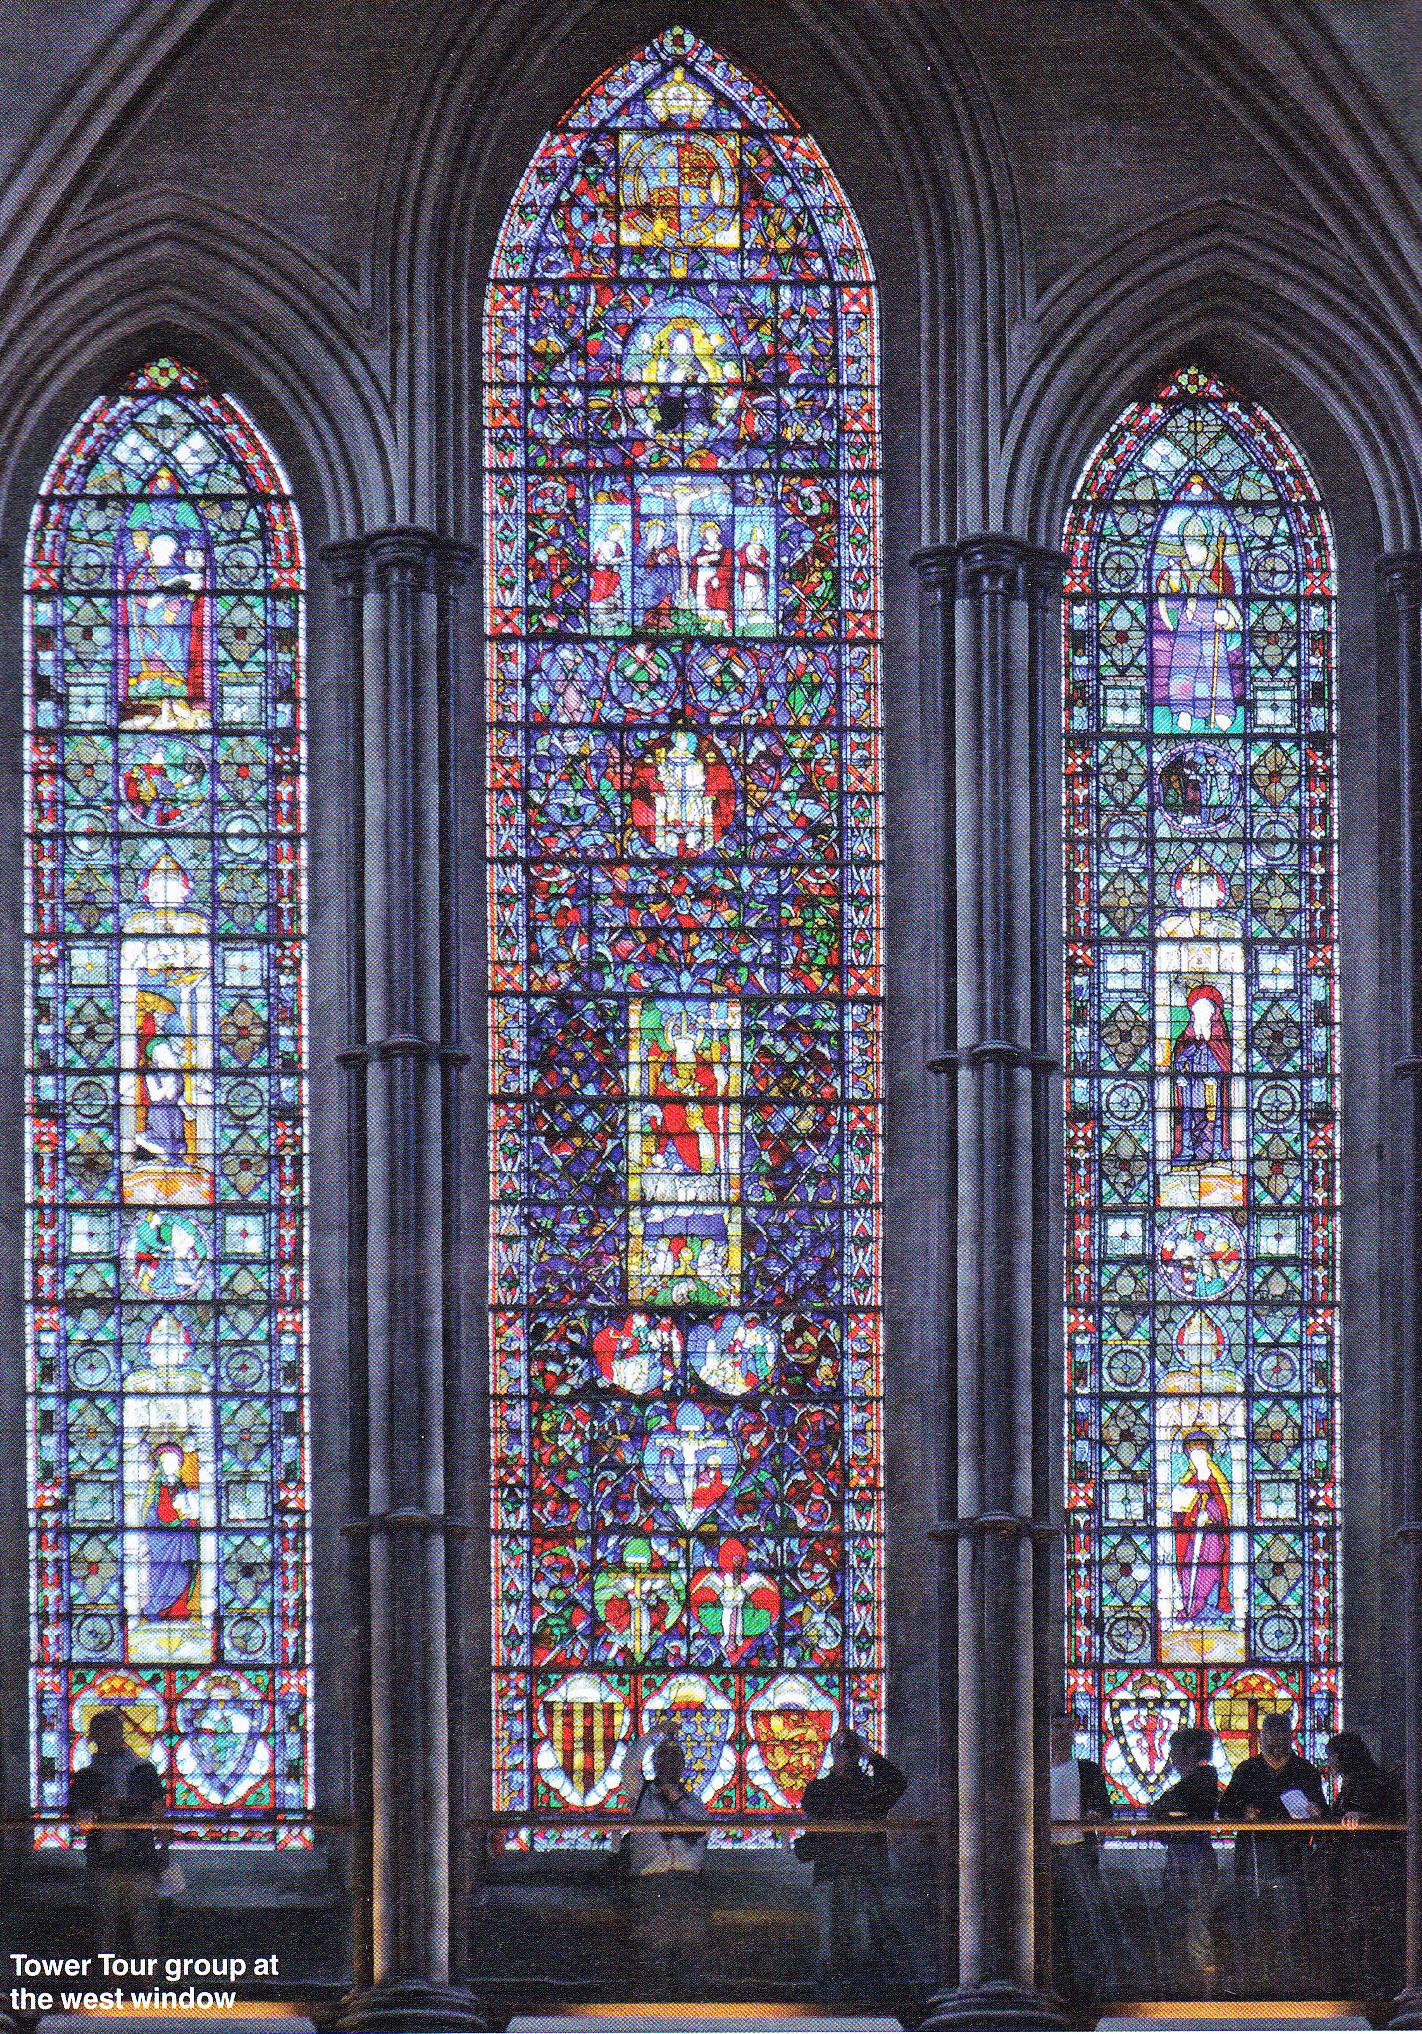 http://www.antiblavers.org/galeria/albums/userpics/10223/Vitrall_Catedral_Salisbury.jpg